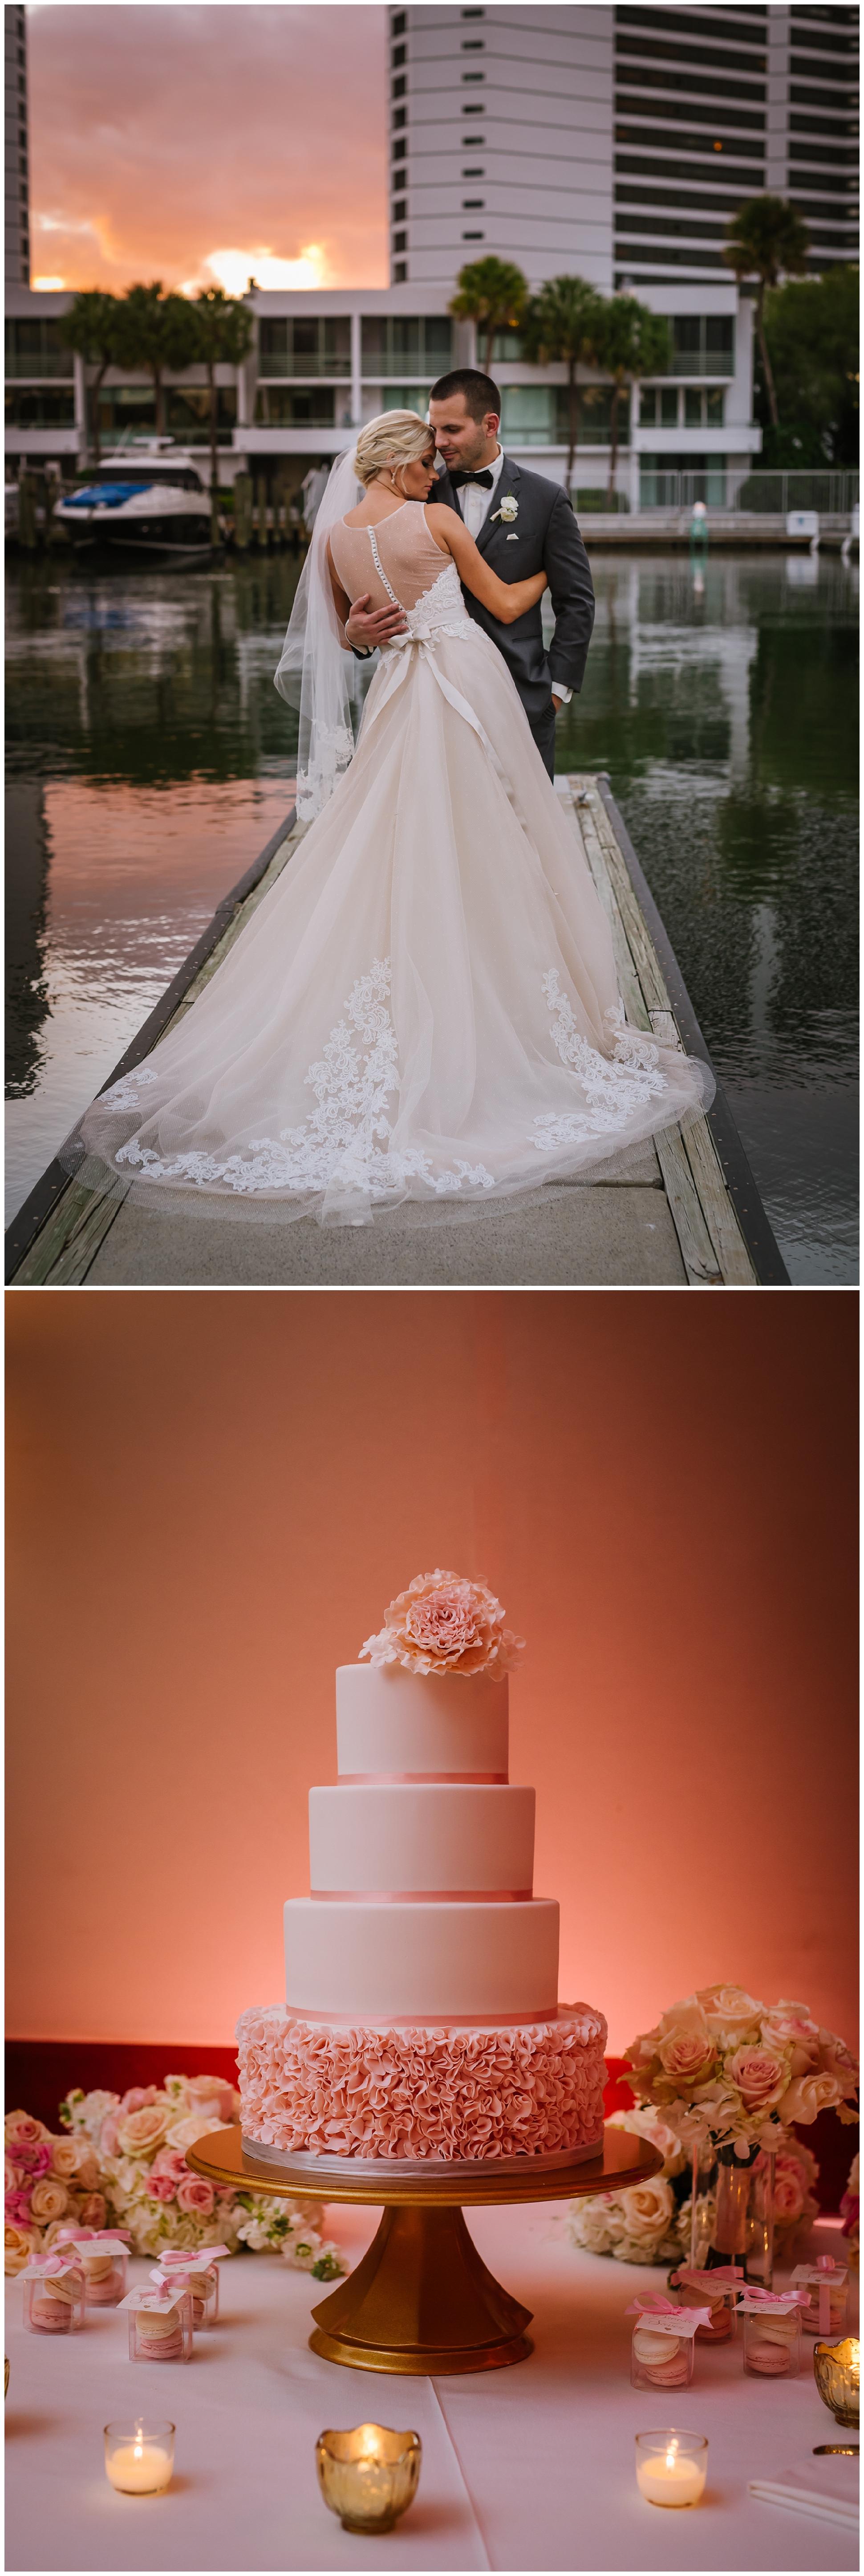 Ashlee-hamon-photography-year-in-review-2016-travel-wanderlust-vsco-adventure-wedding_0049.jpg